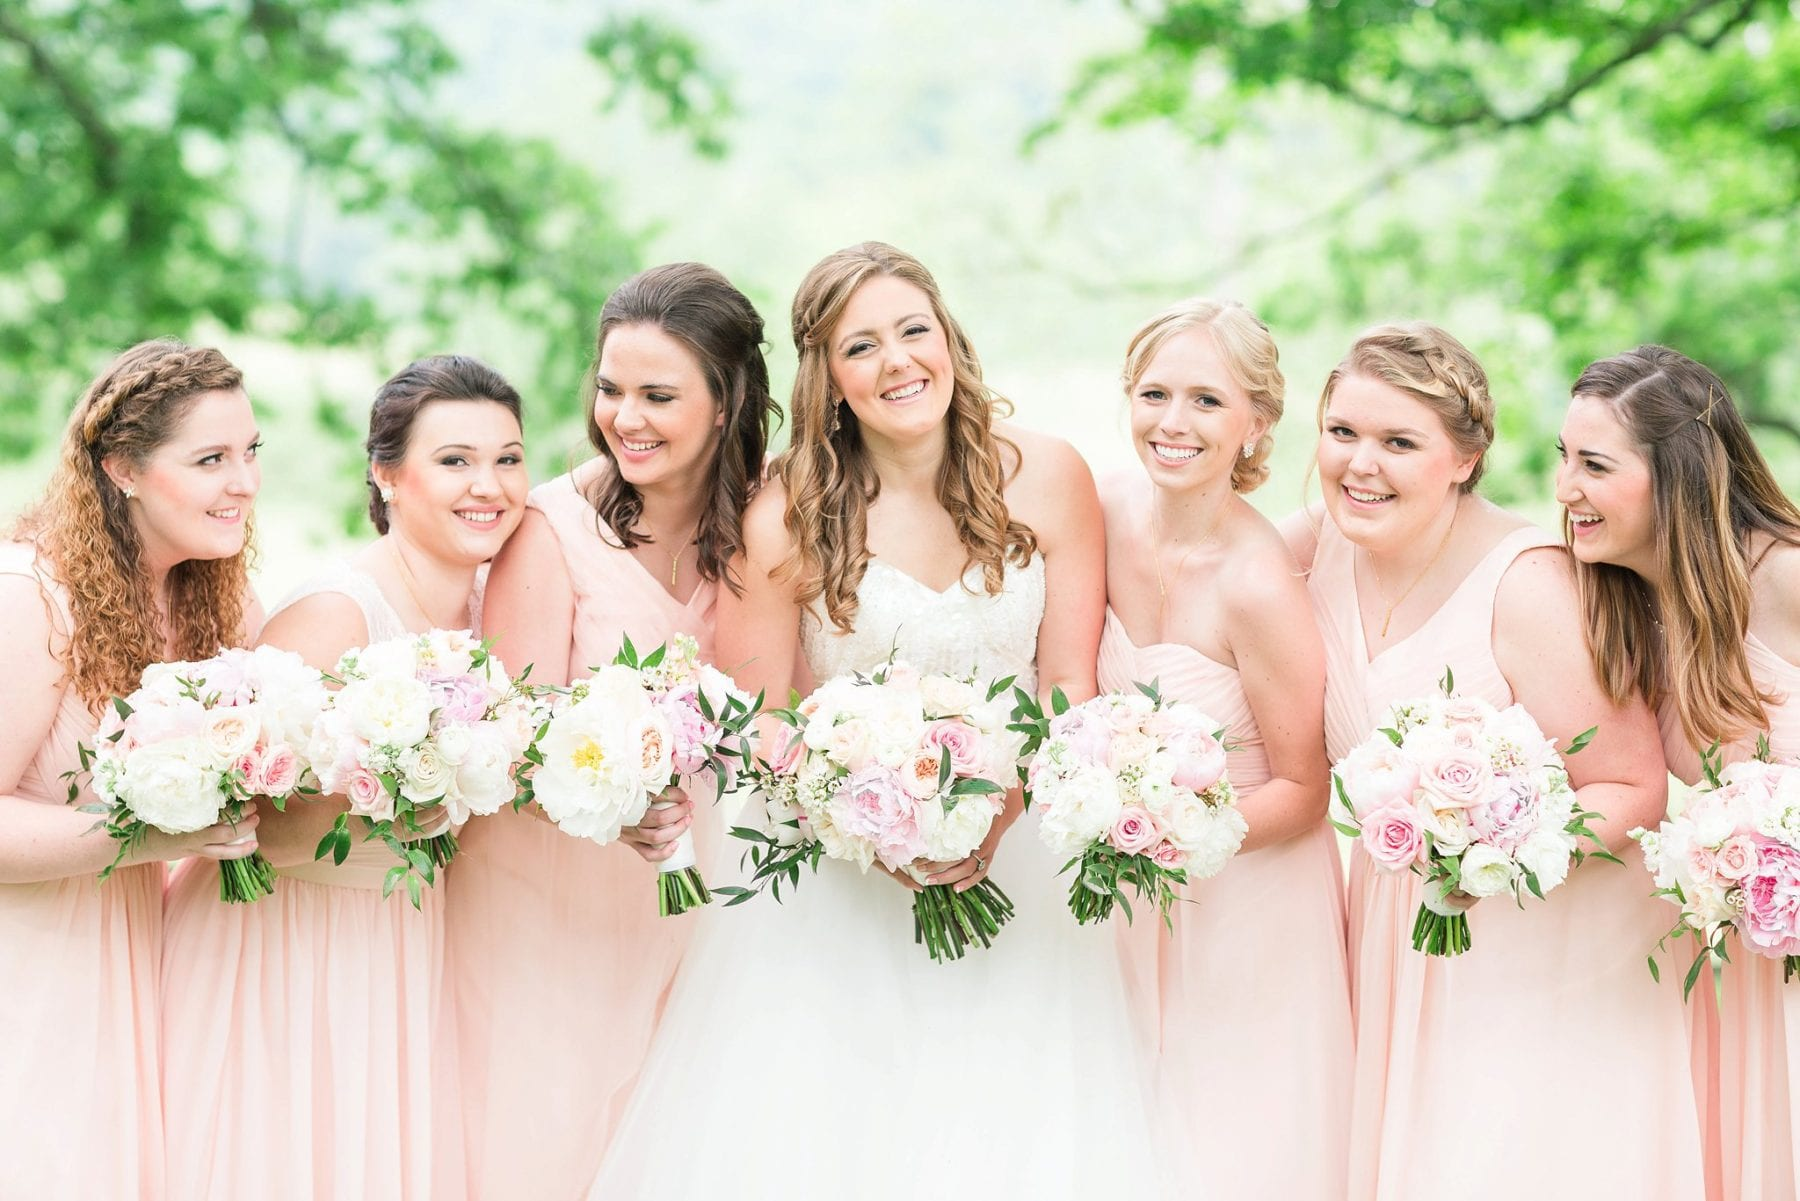 Justin & Megan Big Spring Farm Wedding Photos-151.jpg